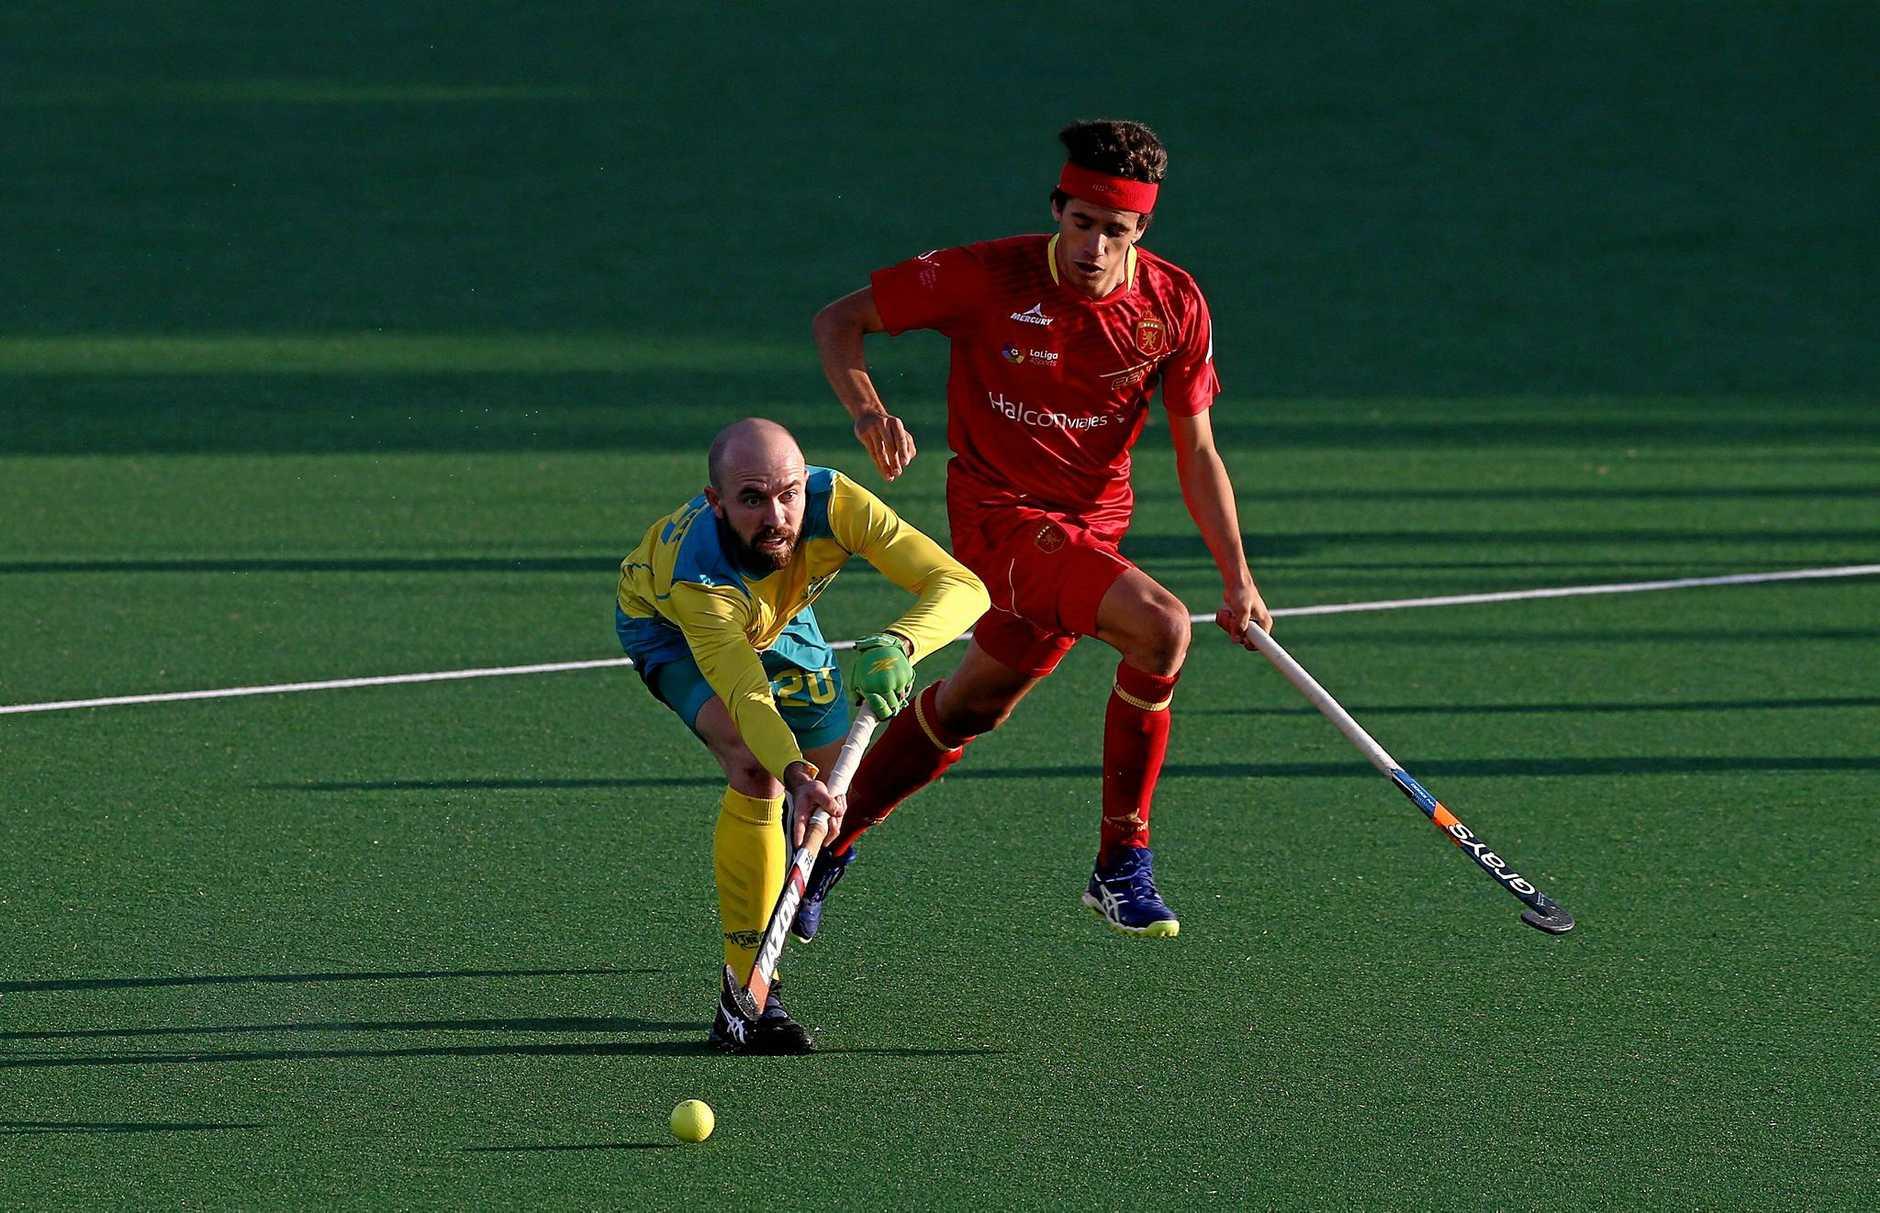 Matthew Swann of Australia passes the ball at the World League Semi-Finals in Johannesburg.